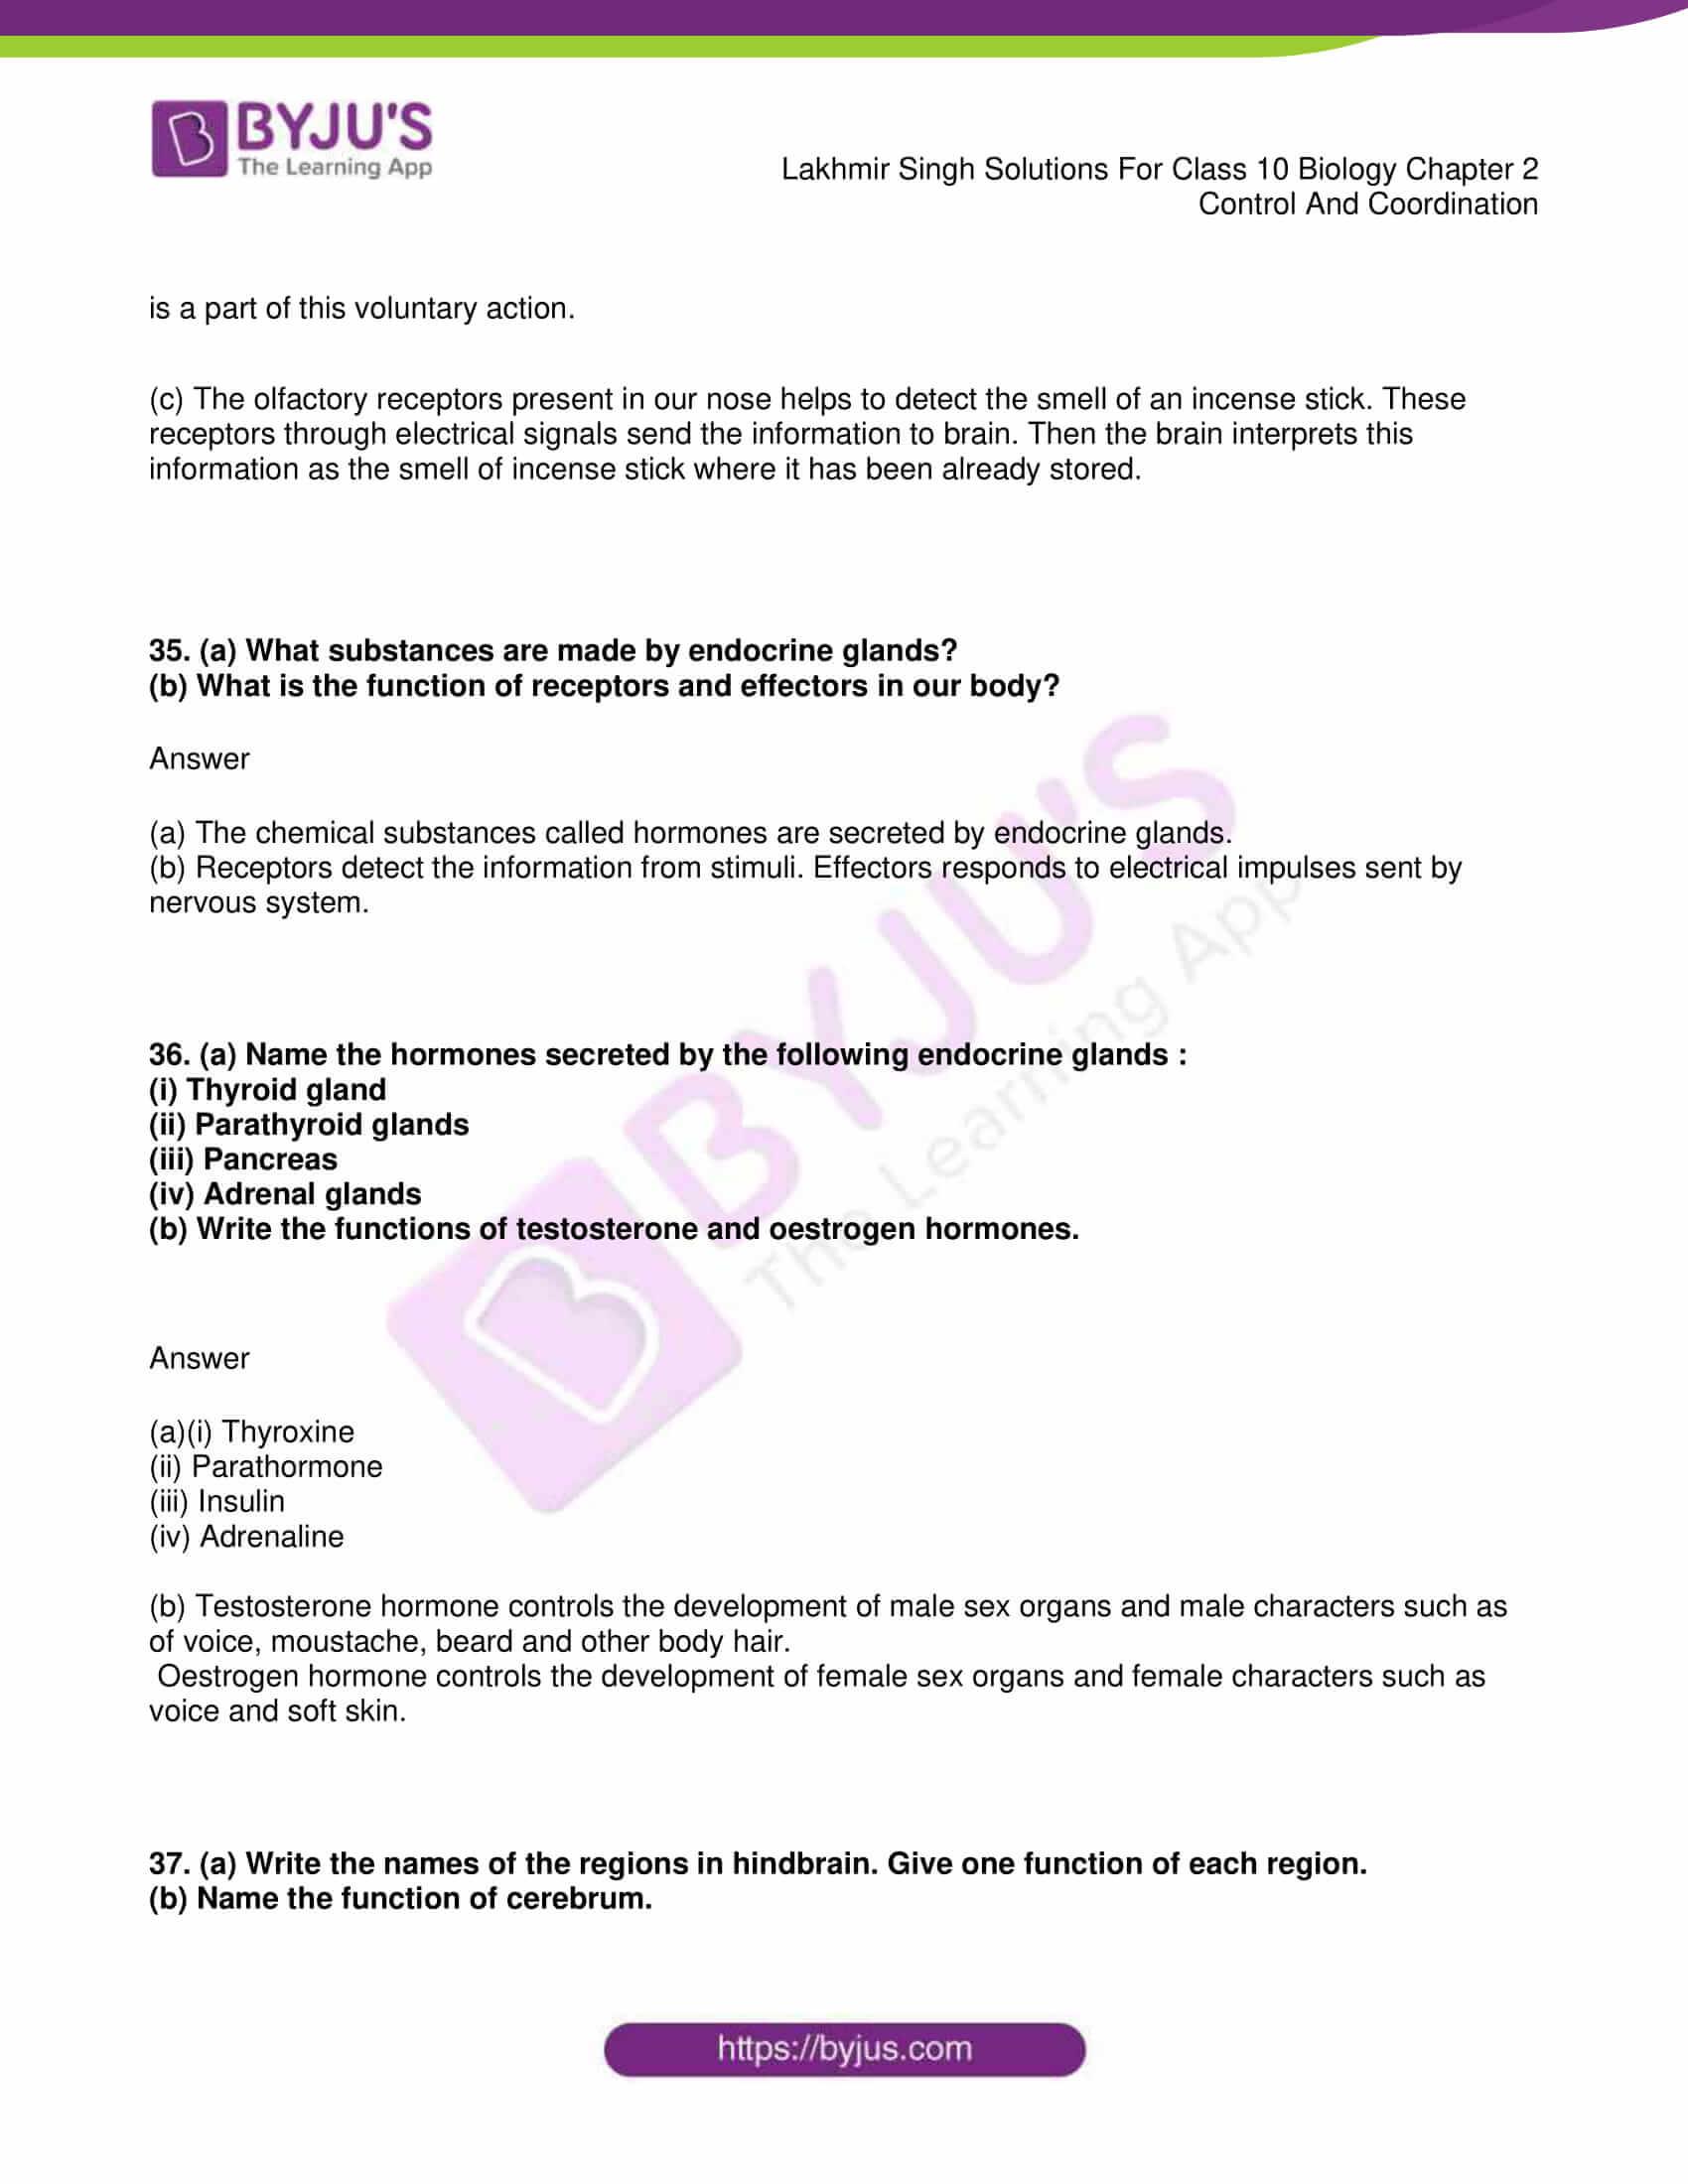 lakhmir singh sol class 10 biology chapter 2 30